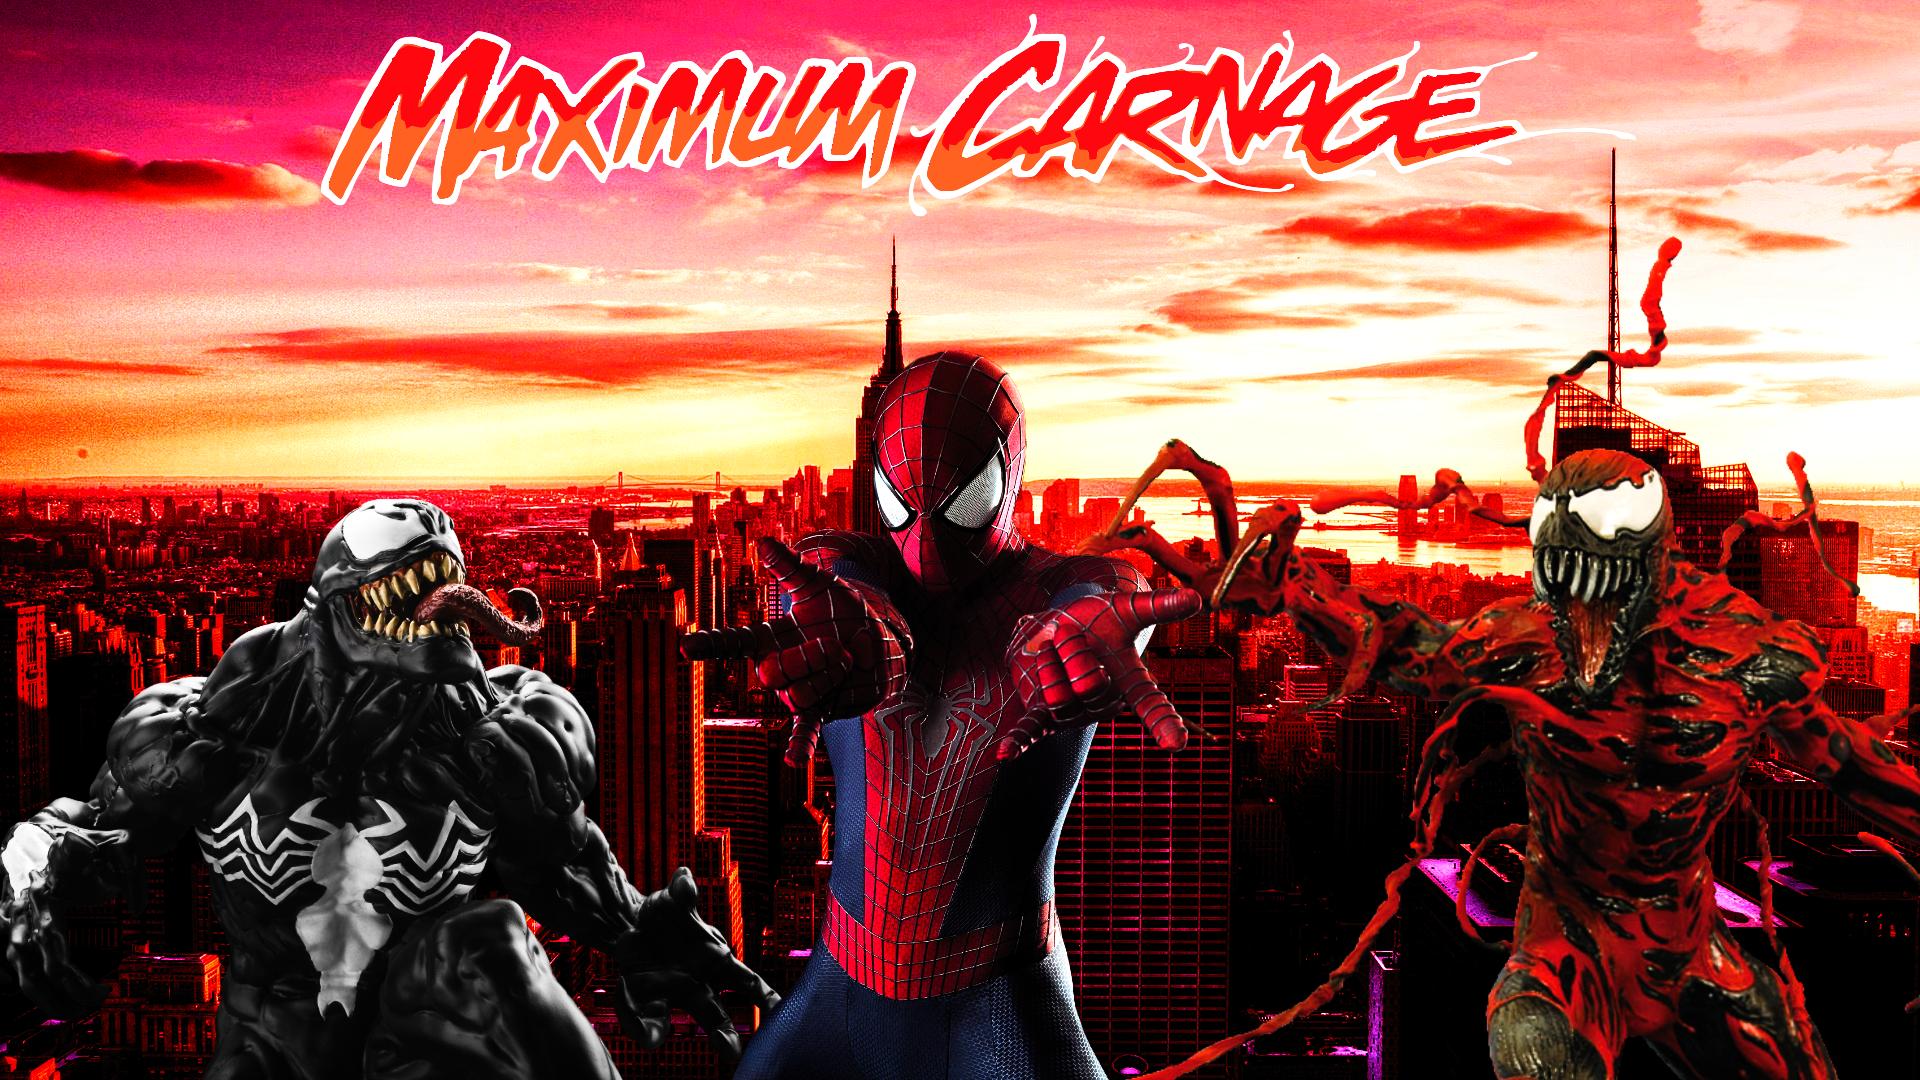 Spider Man and Venom Maximum Carnage Poster 3 by ProfessorAdagio on 1920x1080